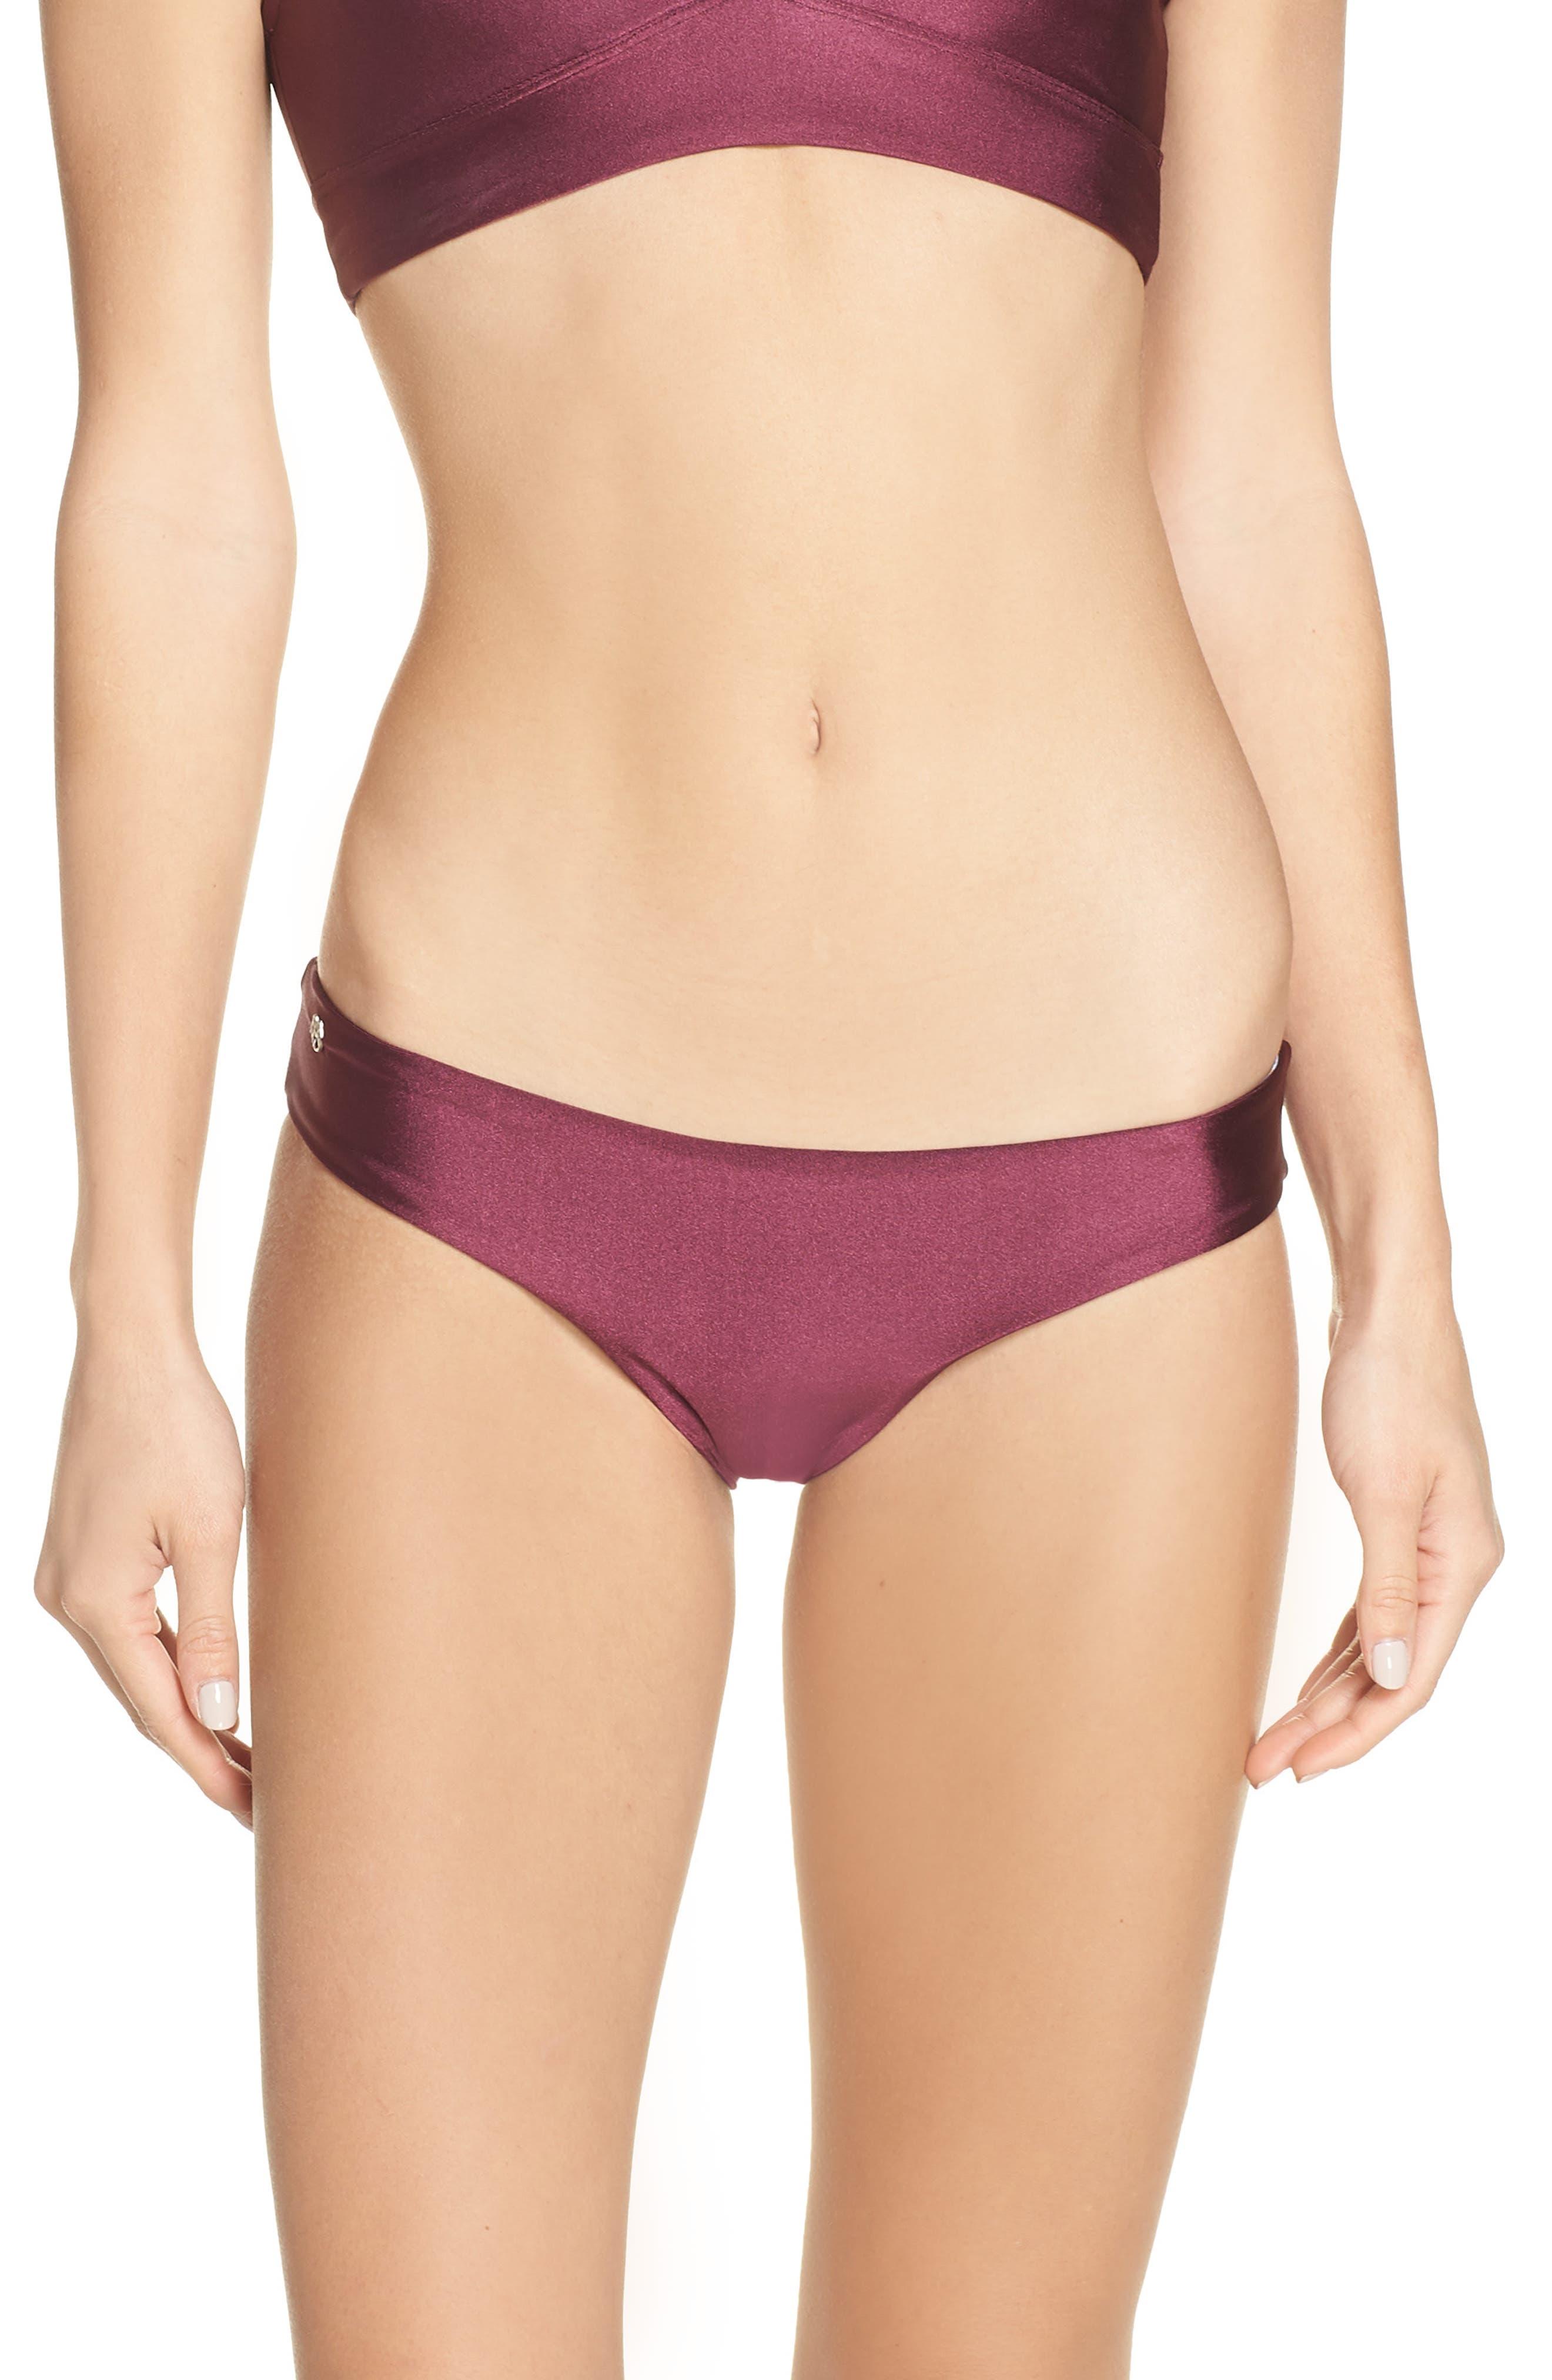 Beach Plum Sublime Reversible Bikini Bottoms,                             Main thumbnail 1, color,                             BEACH PLUM